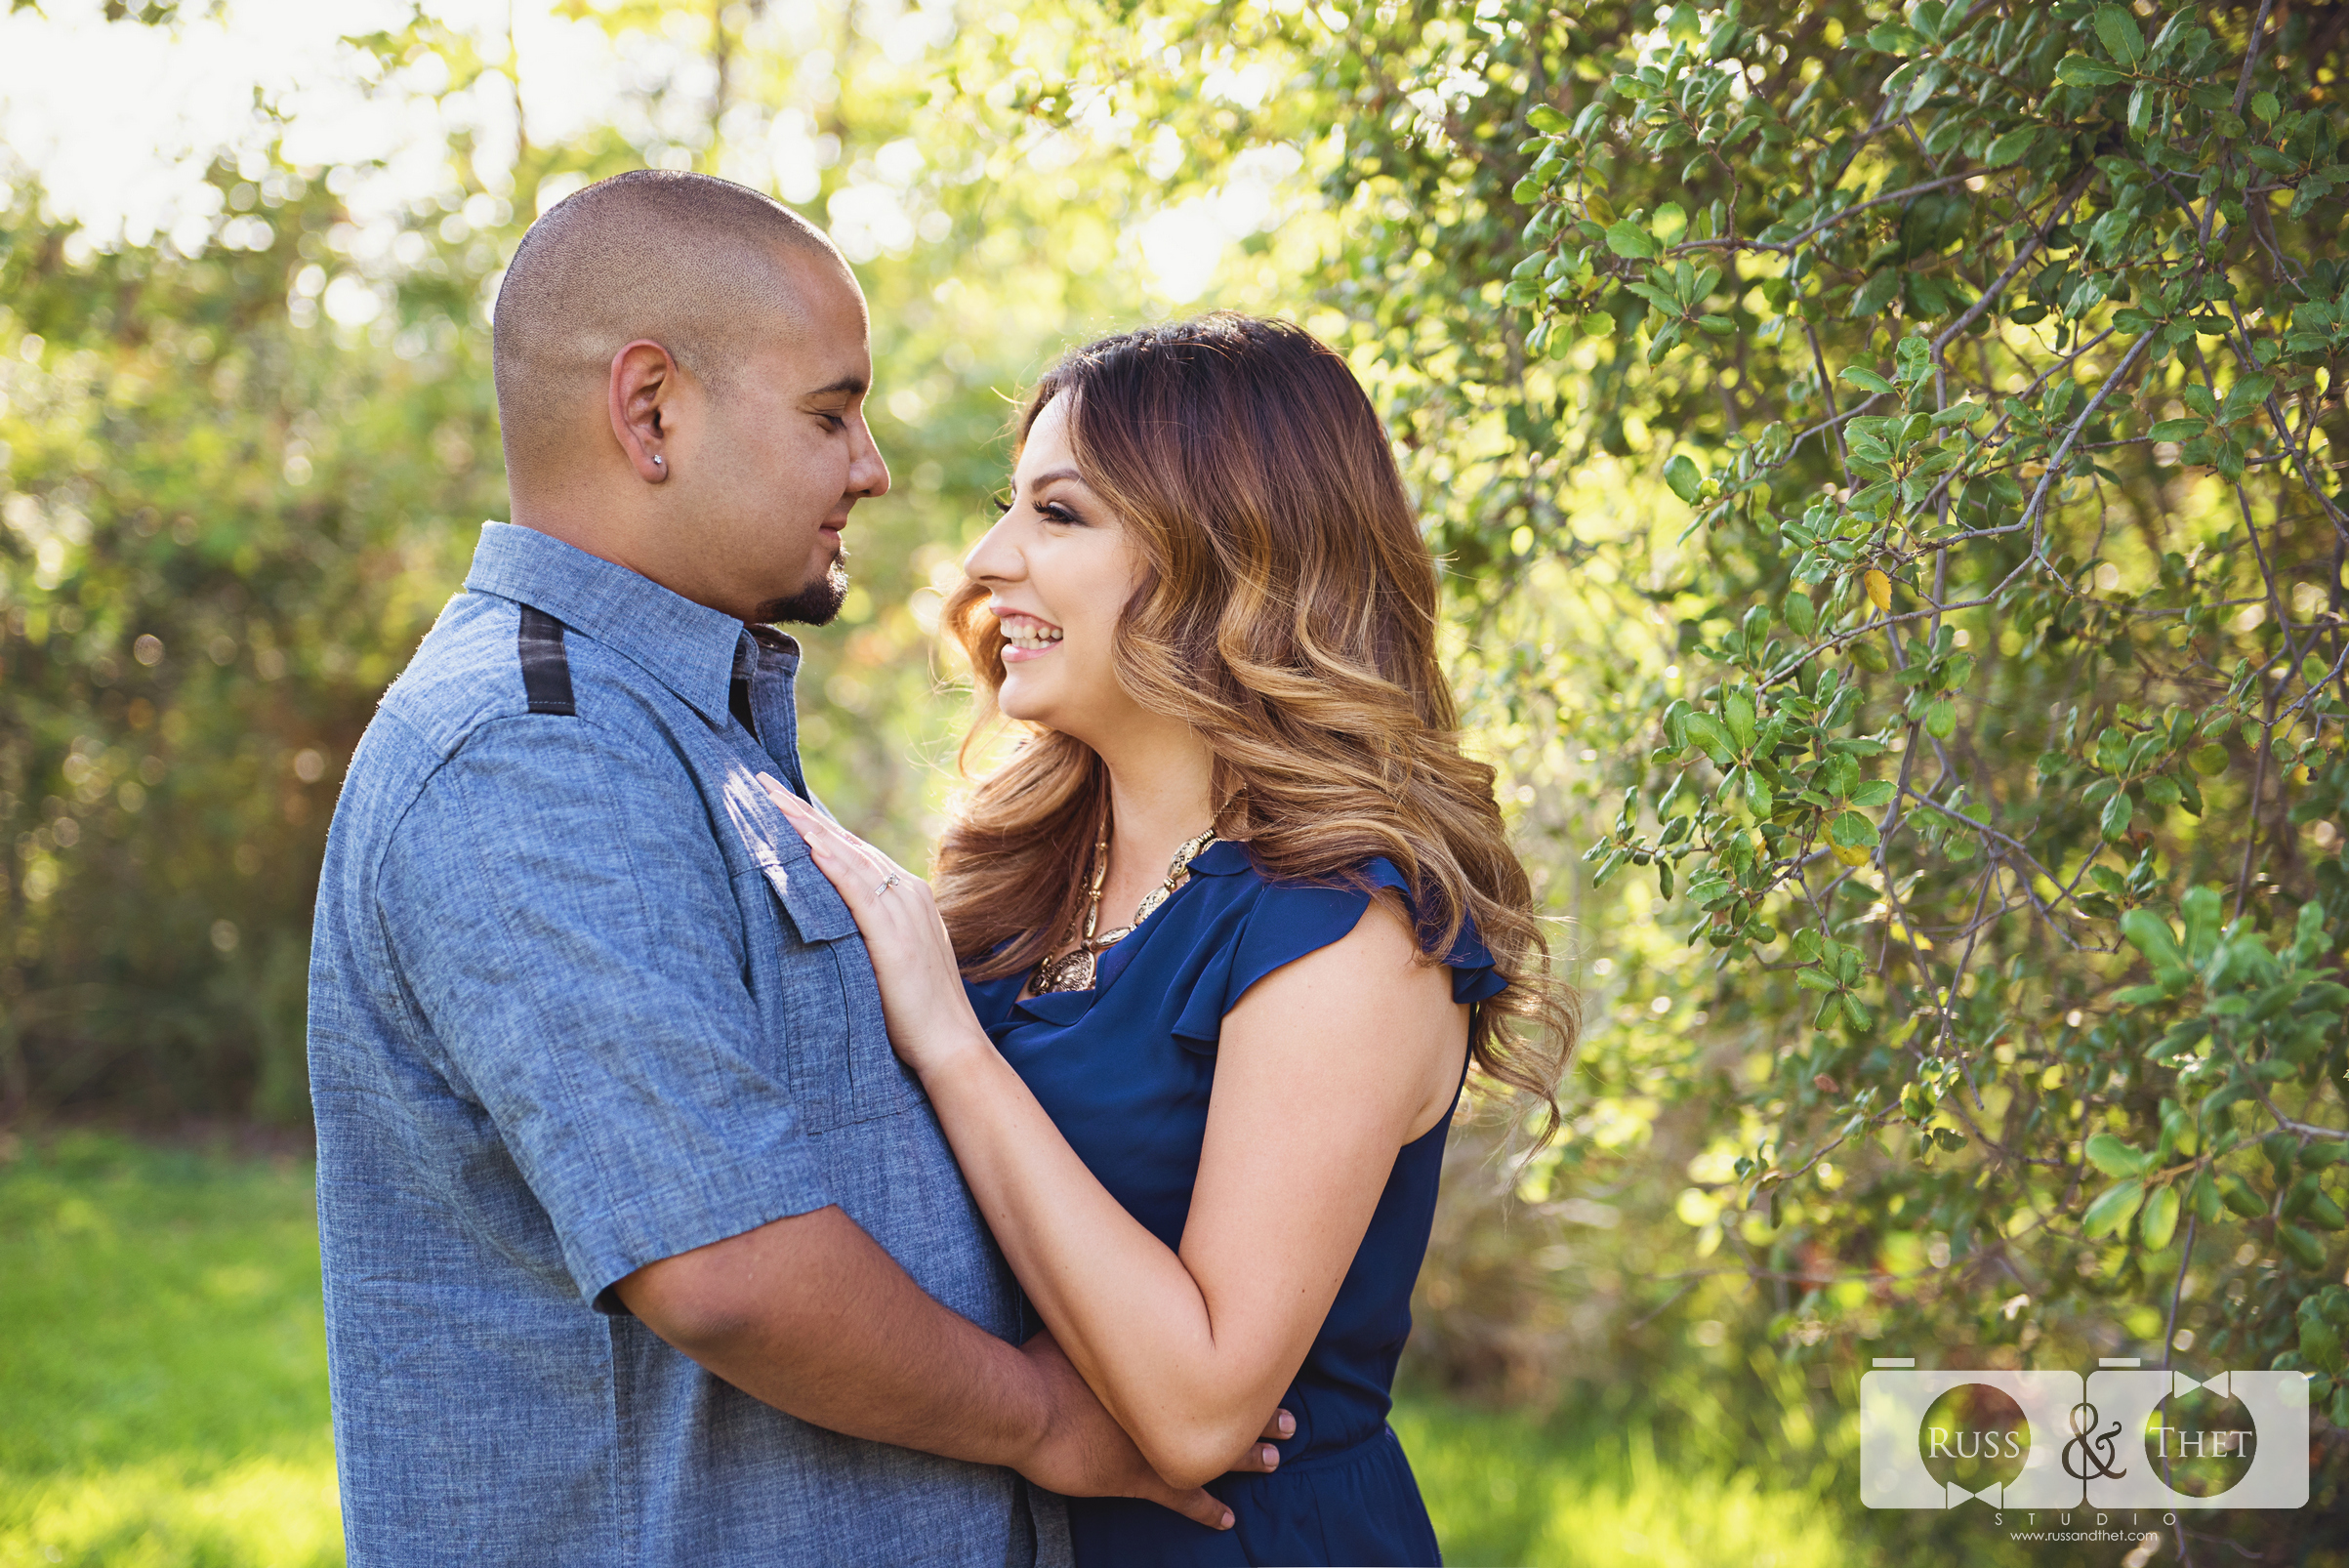 Vista-Hermosa-Park-Engagement-Photographer (2).jpg